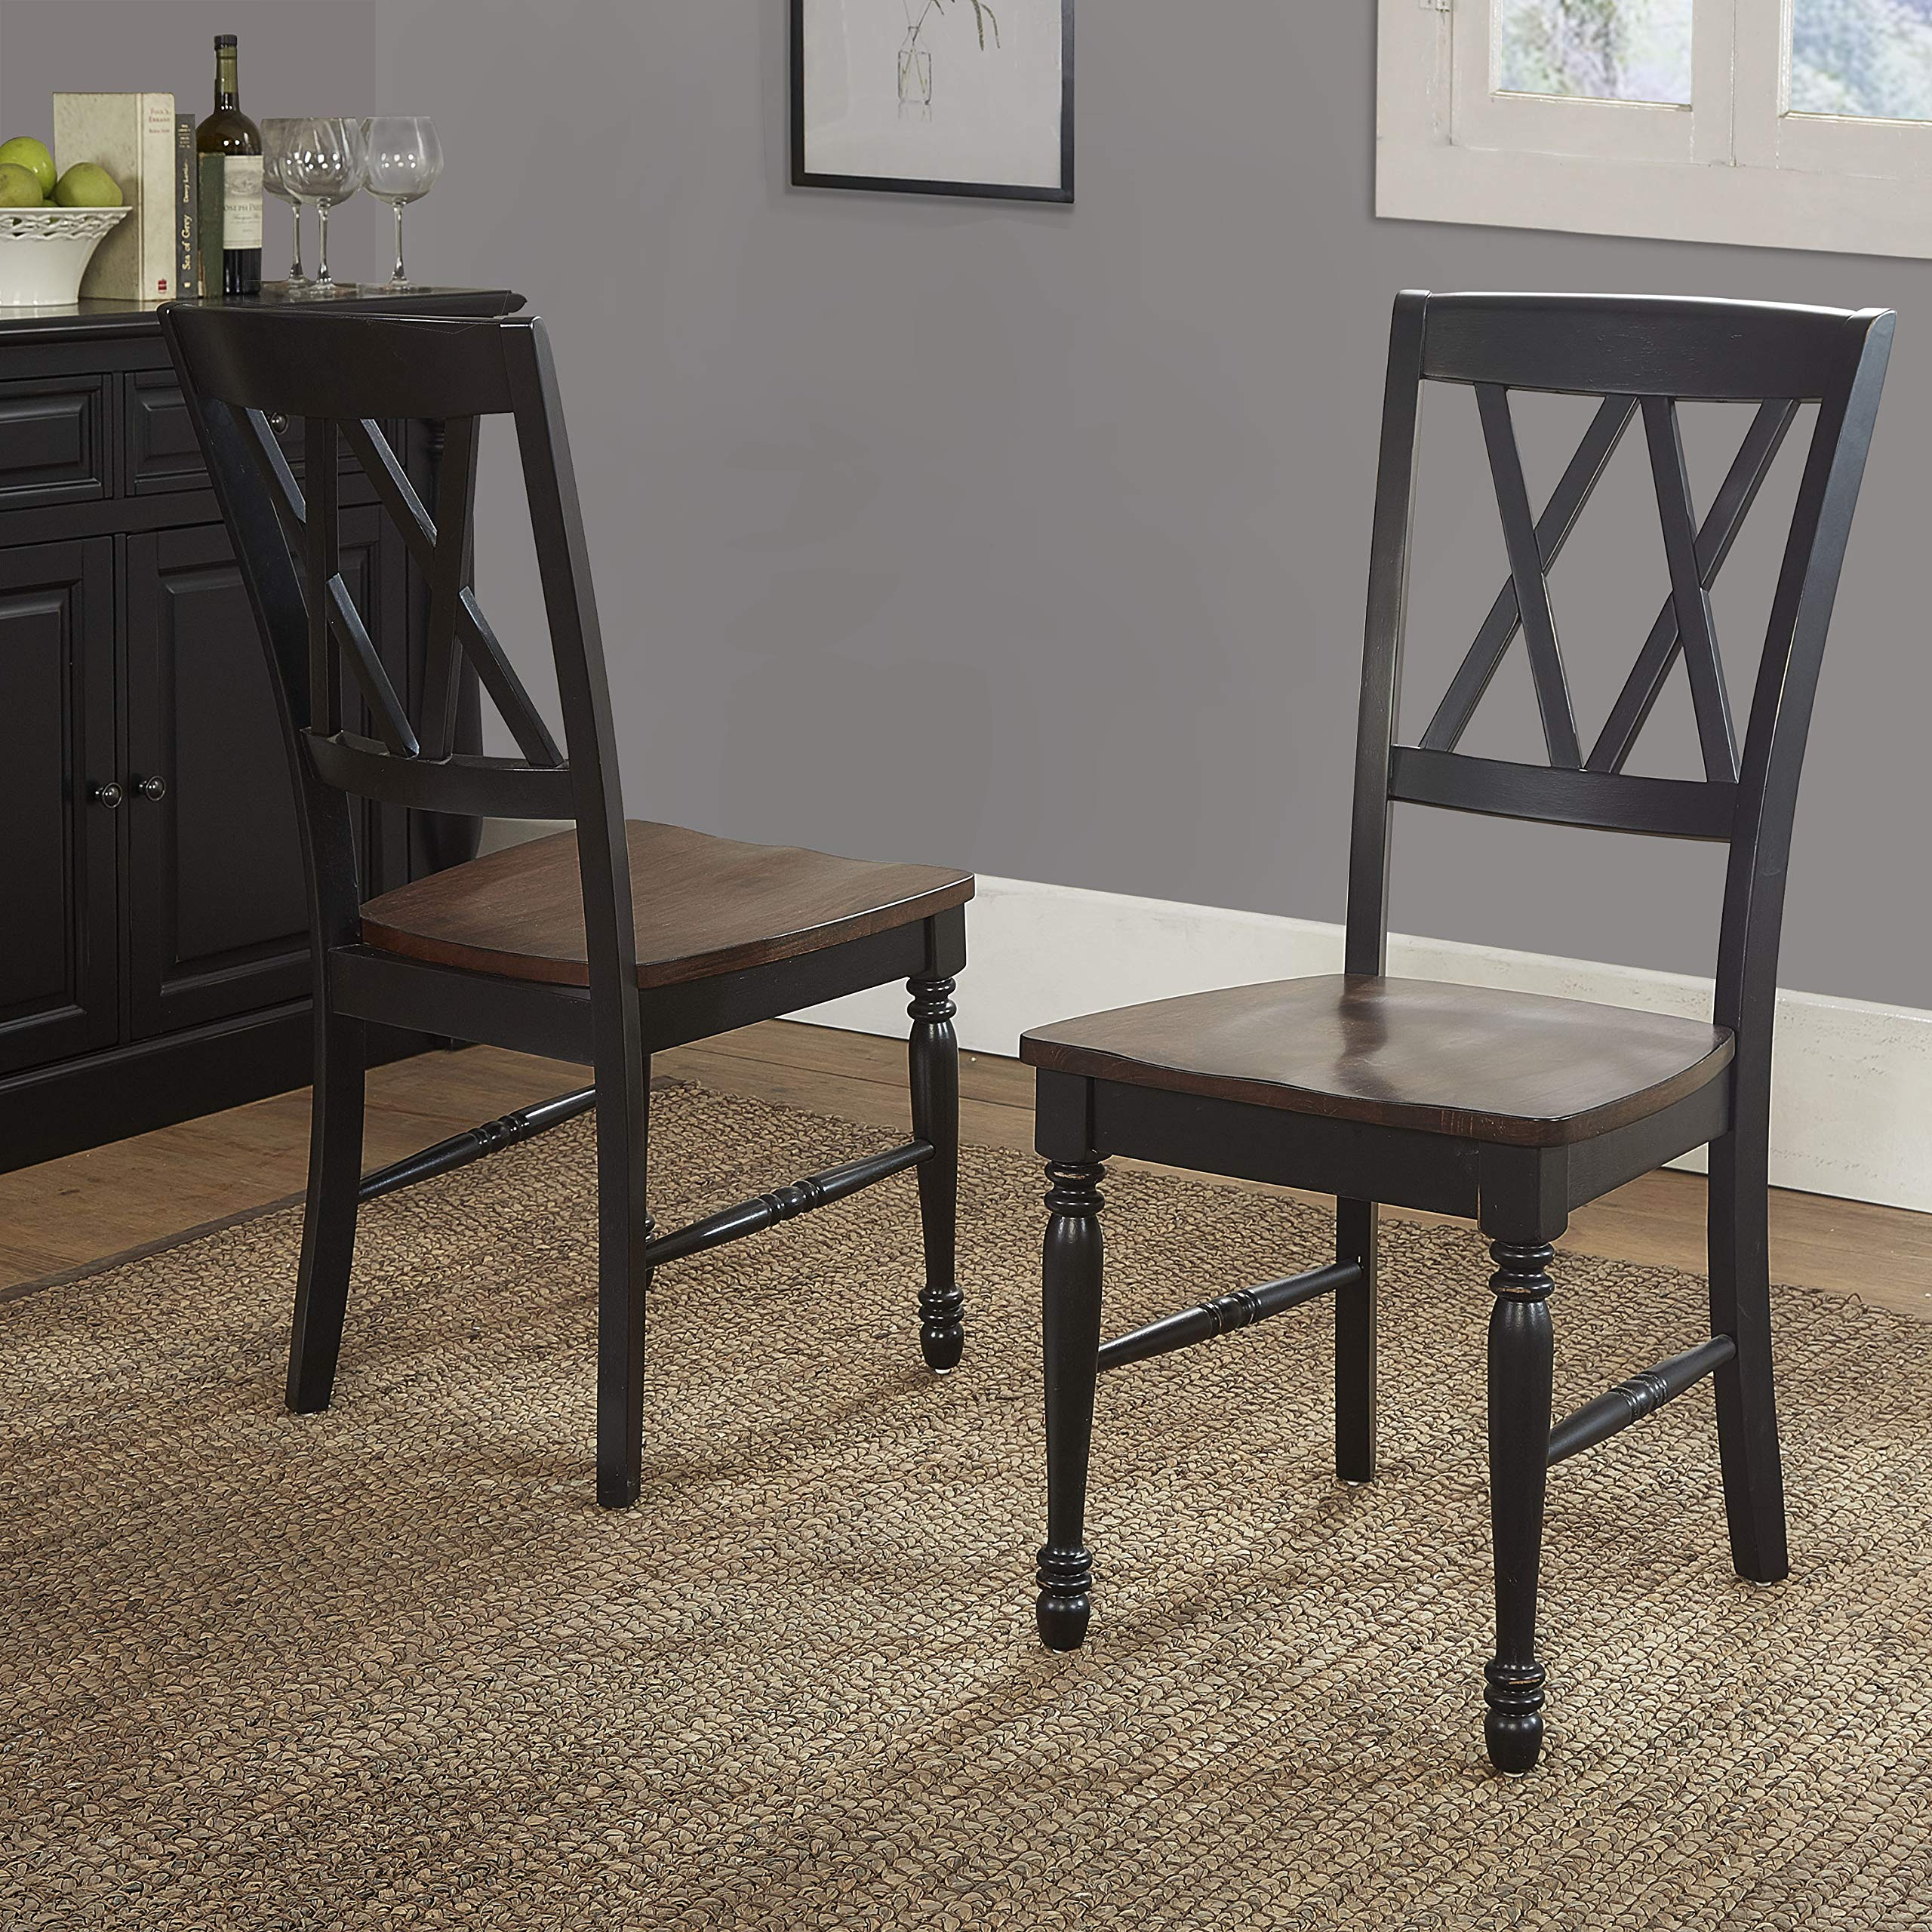 Crosley Furniture KF20001-BK Shelby 7-Piece Dining Set, Black by Crosley Furniture (Image #9)